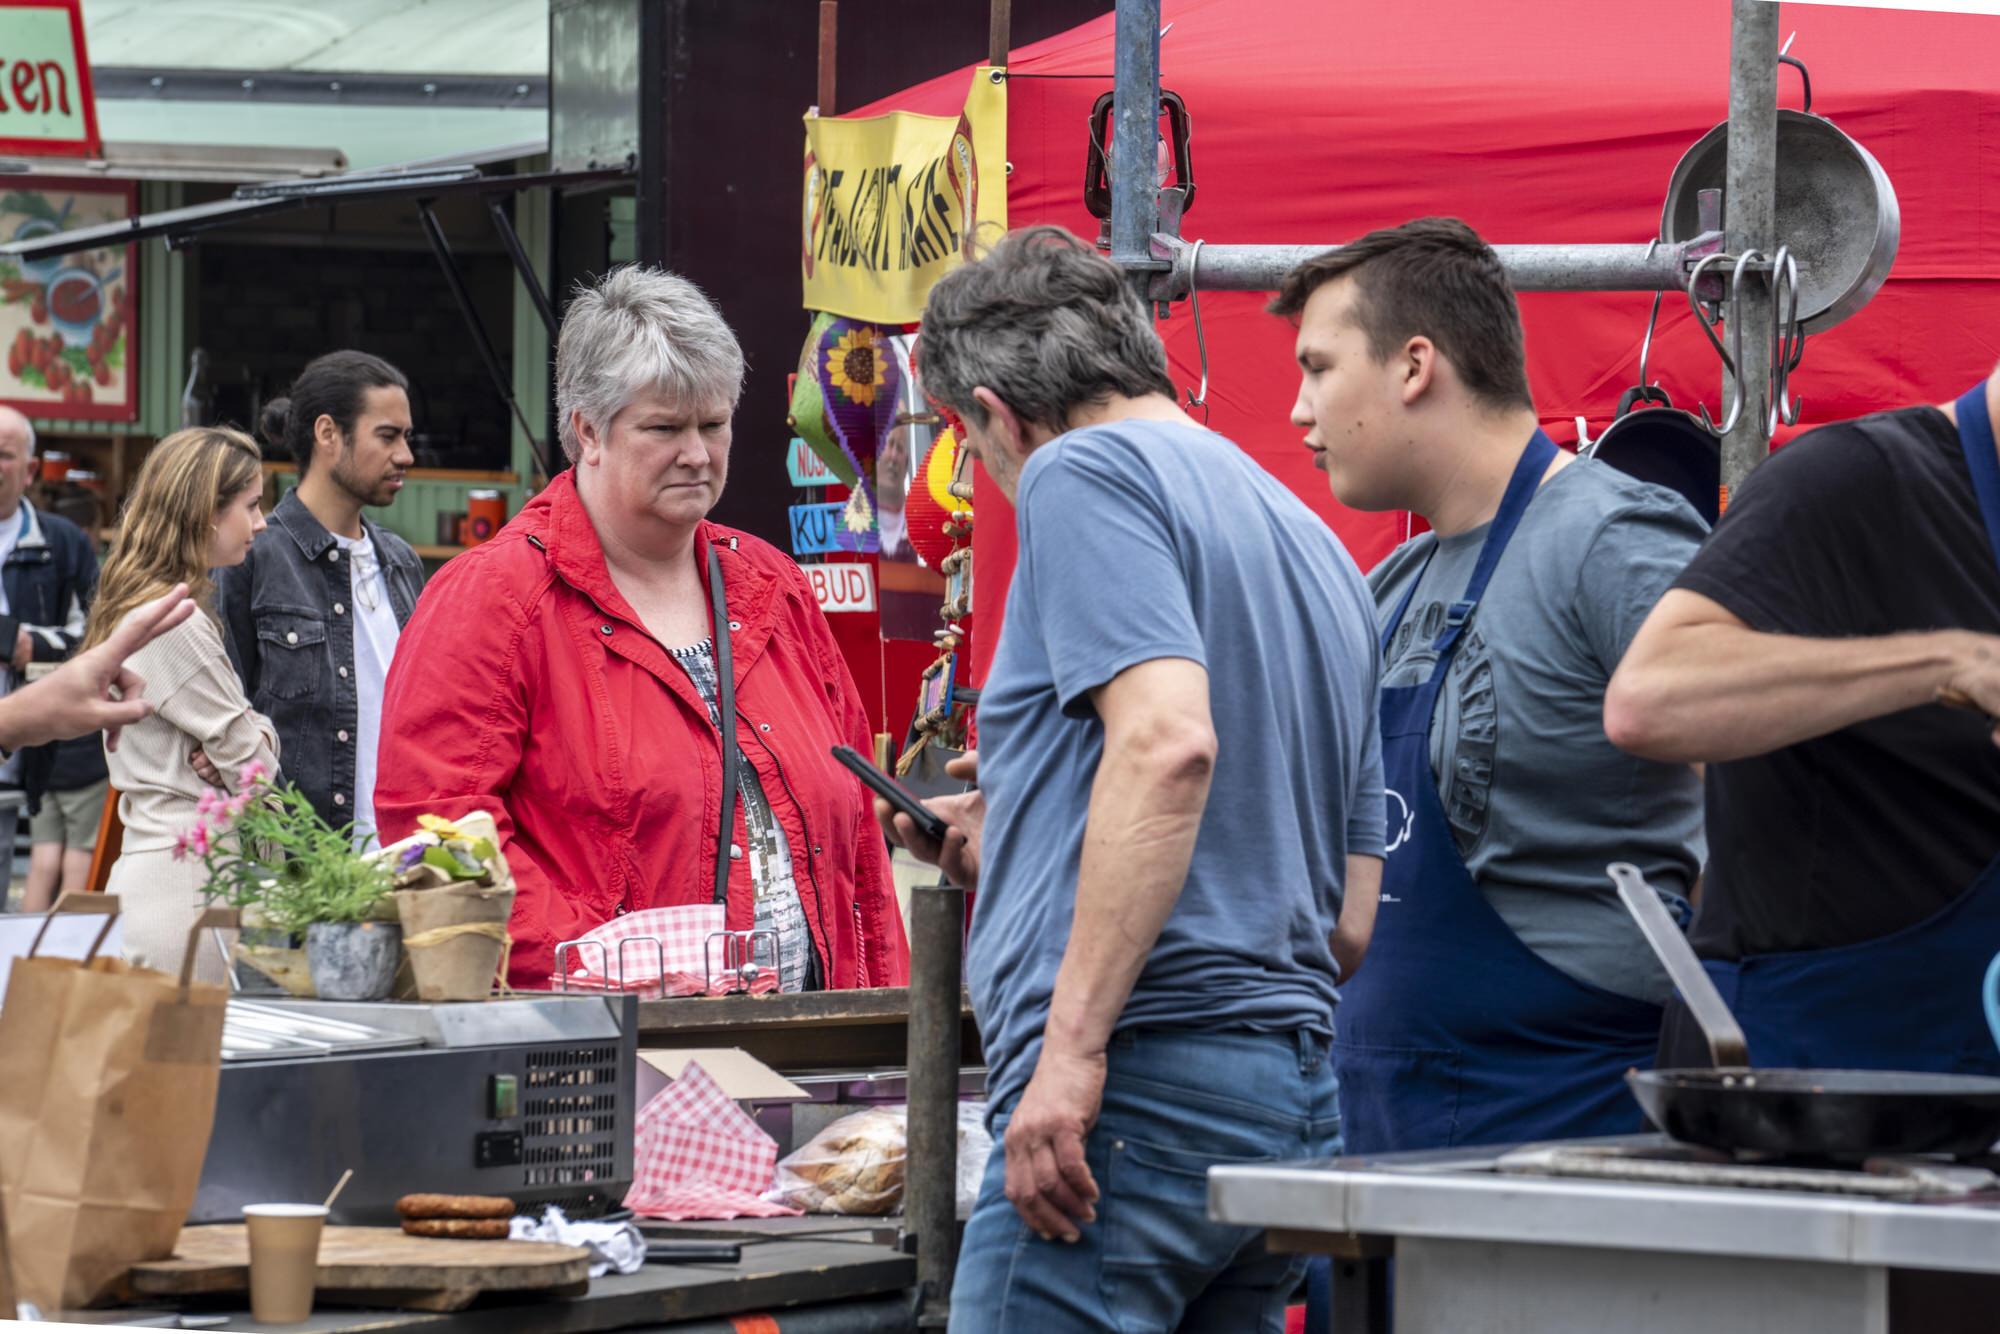 SPIJS-foodfestival-5juni21-00051.jpg